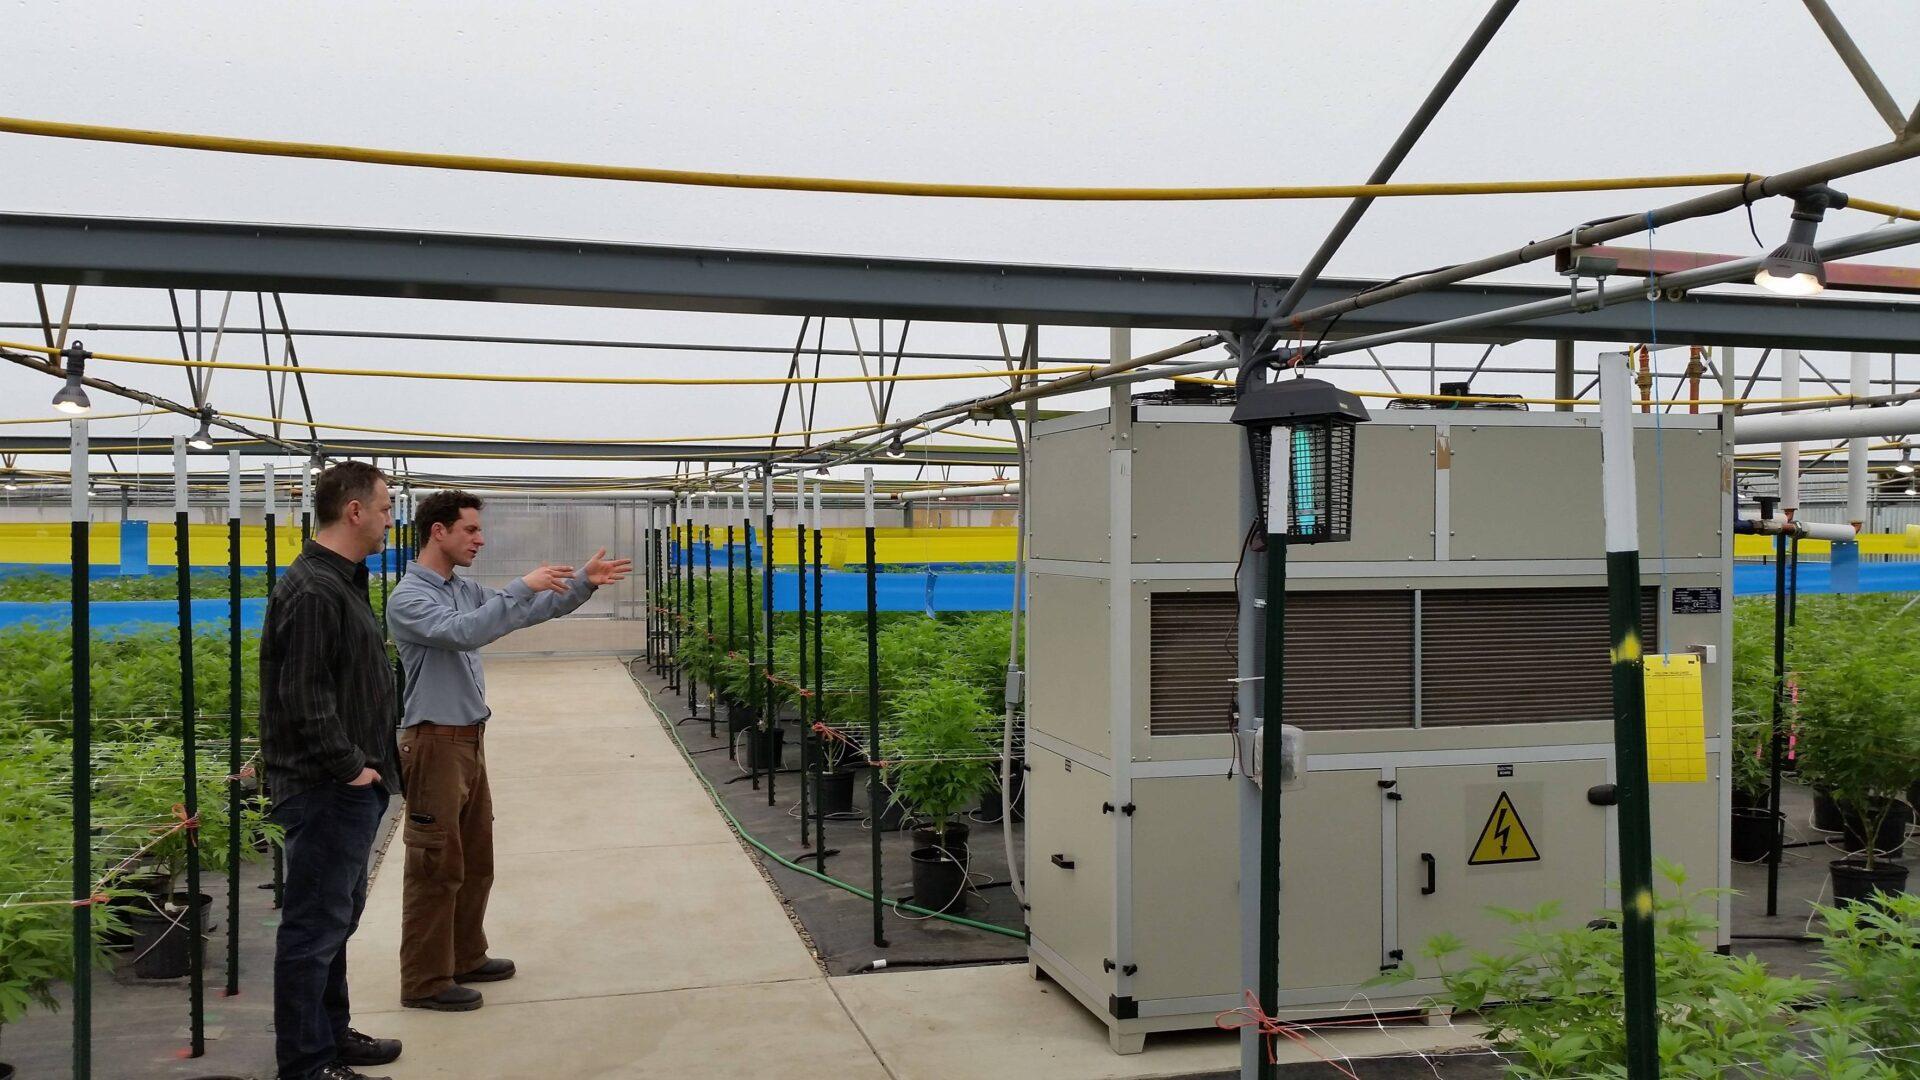 Drygair DG6 DG5 greenhouse dehumidifier small unit